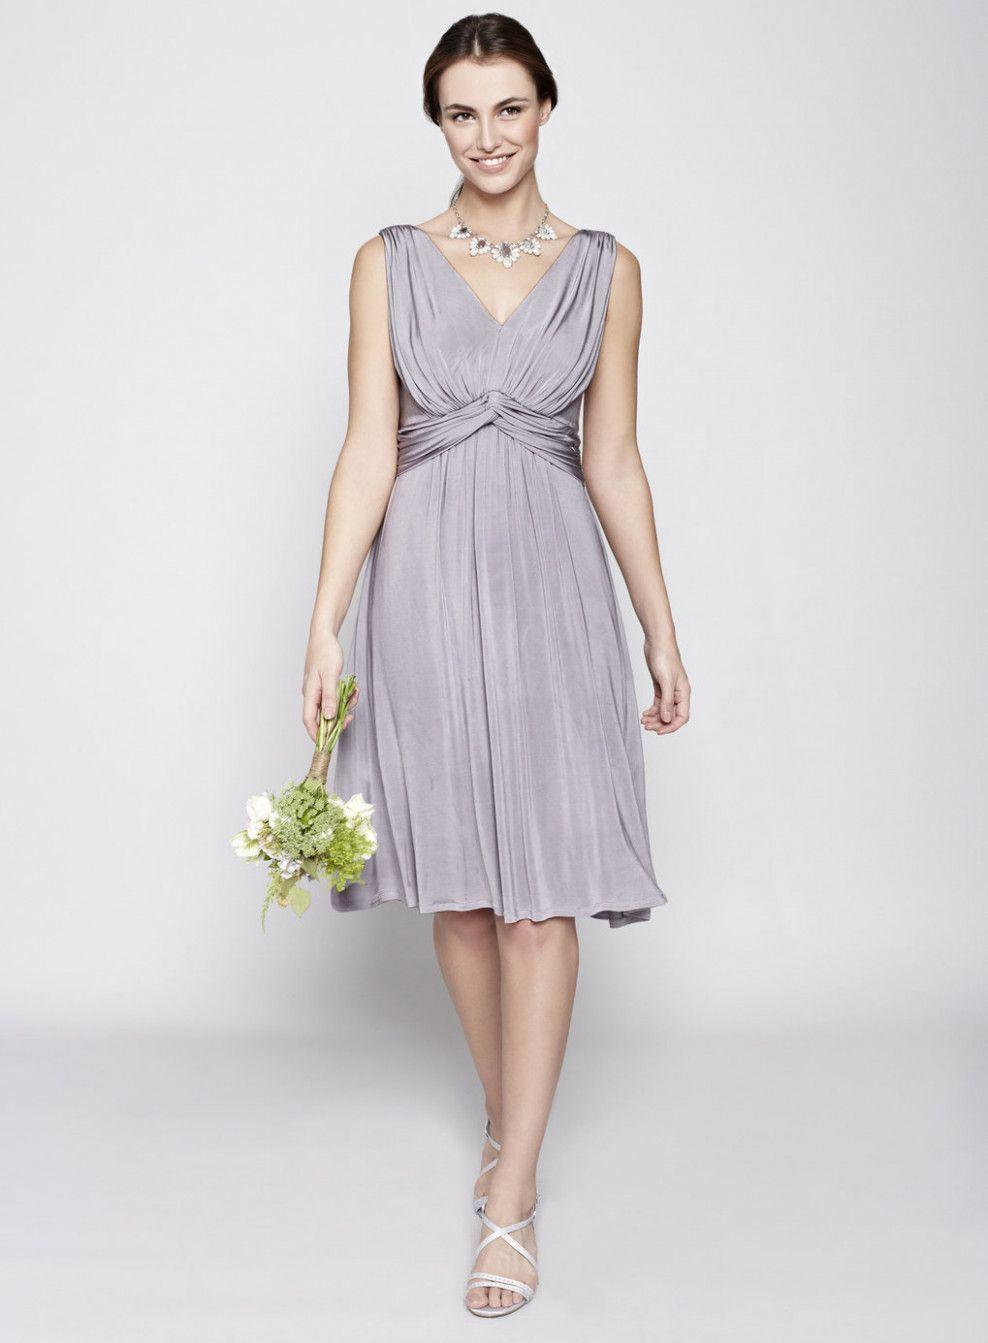 Wedding Bridesmaids Gray Grey Dresses wedding flower arrangements